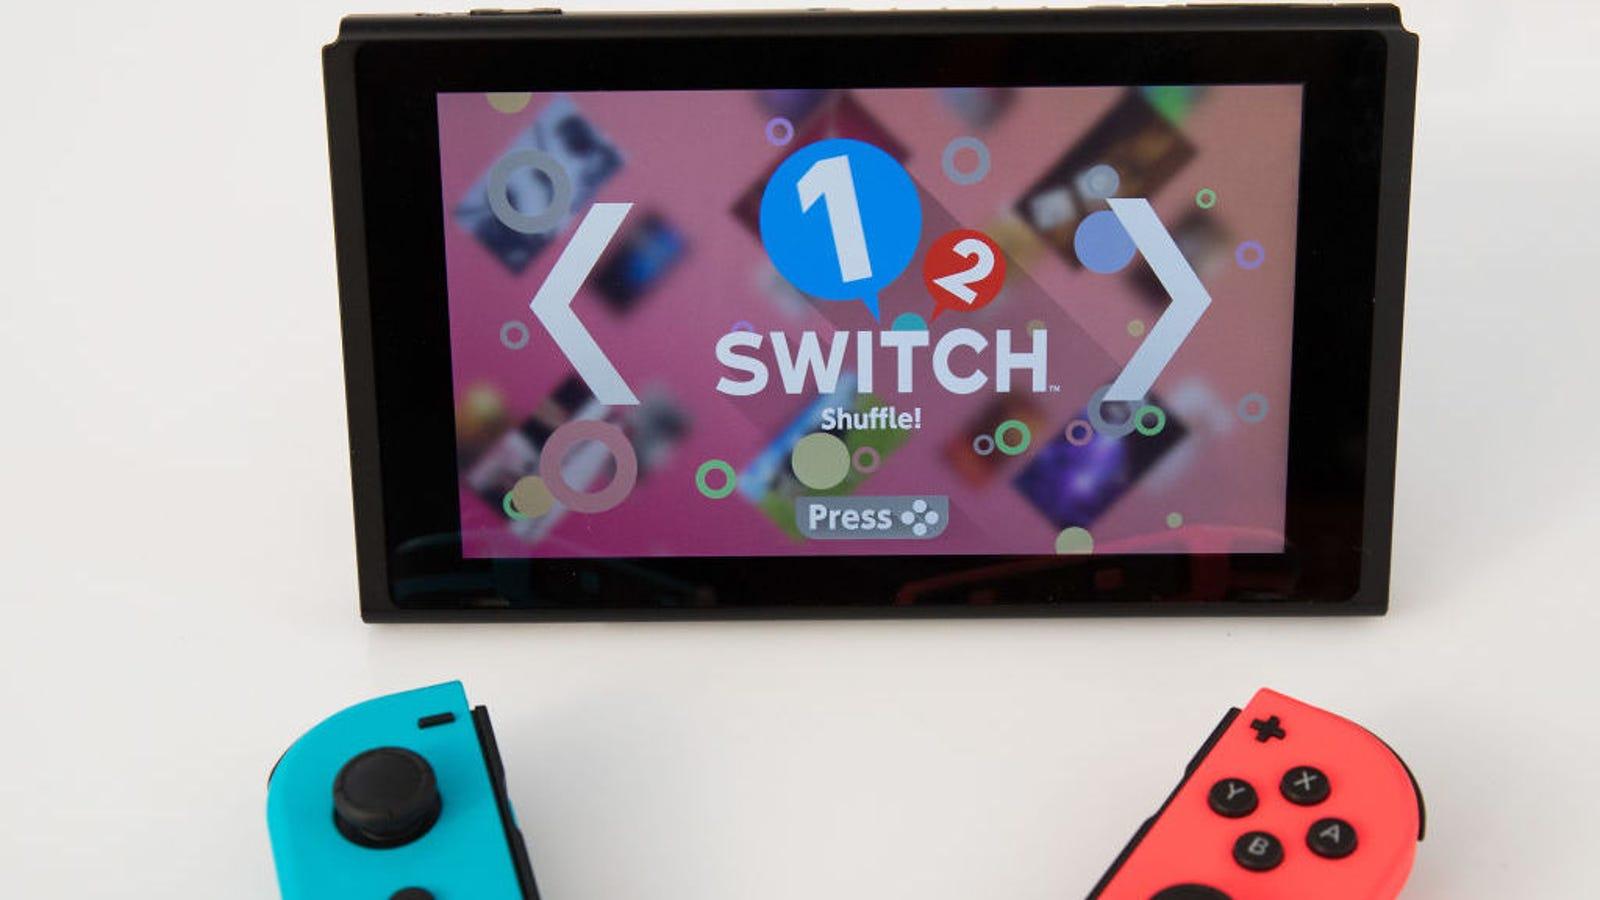 How To Add Friends Your Nintendo Switch 3 Way Minecraft